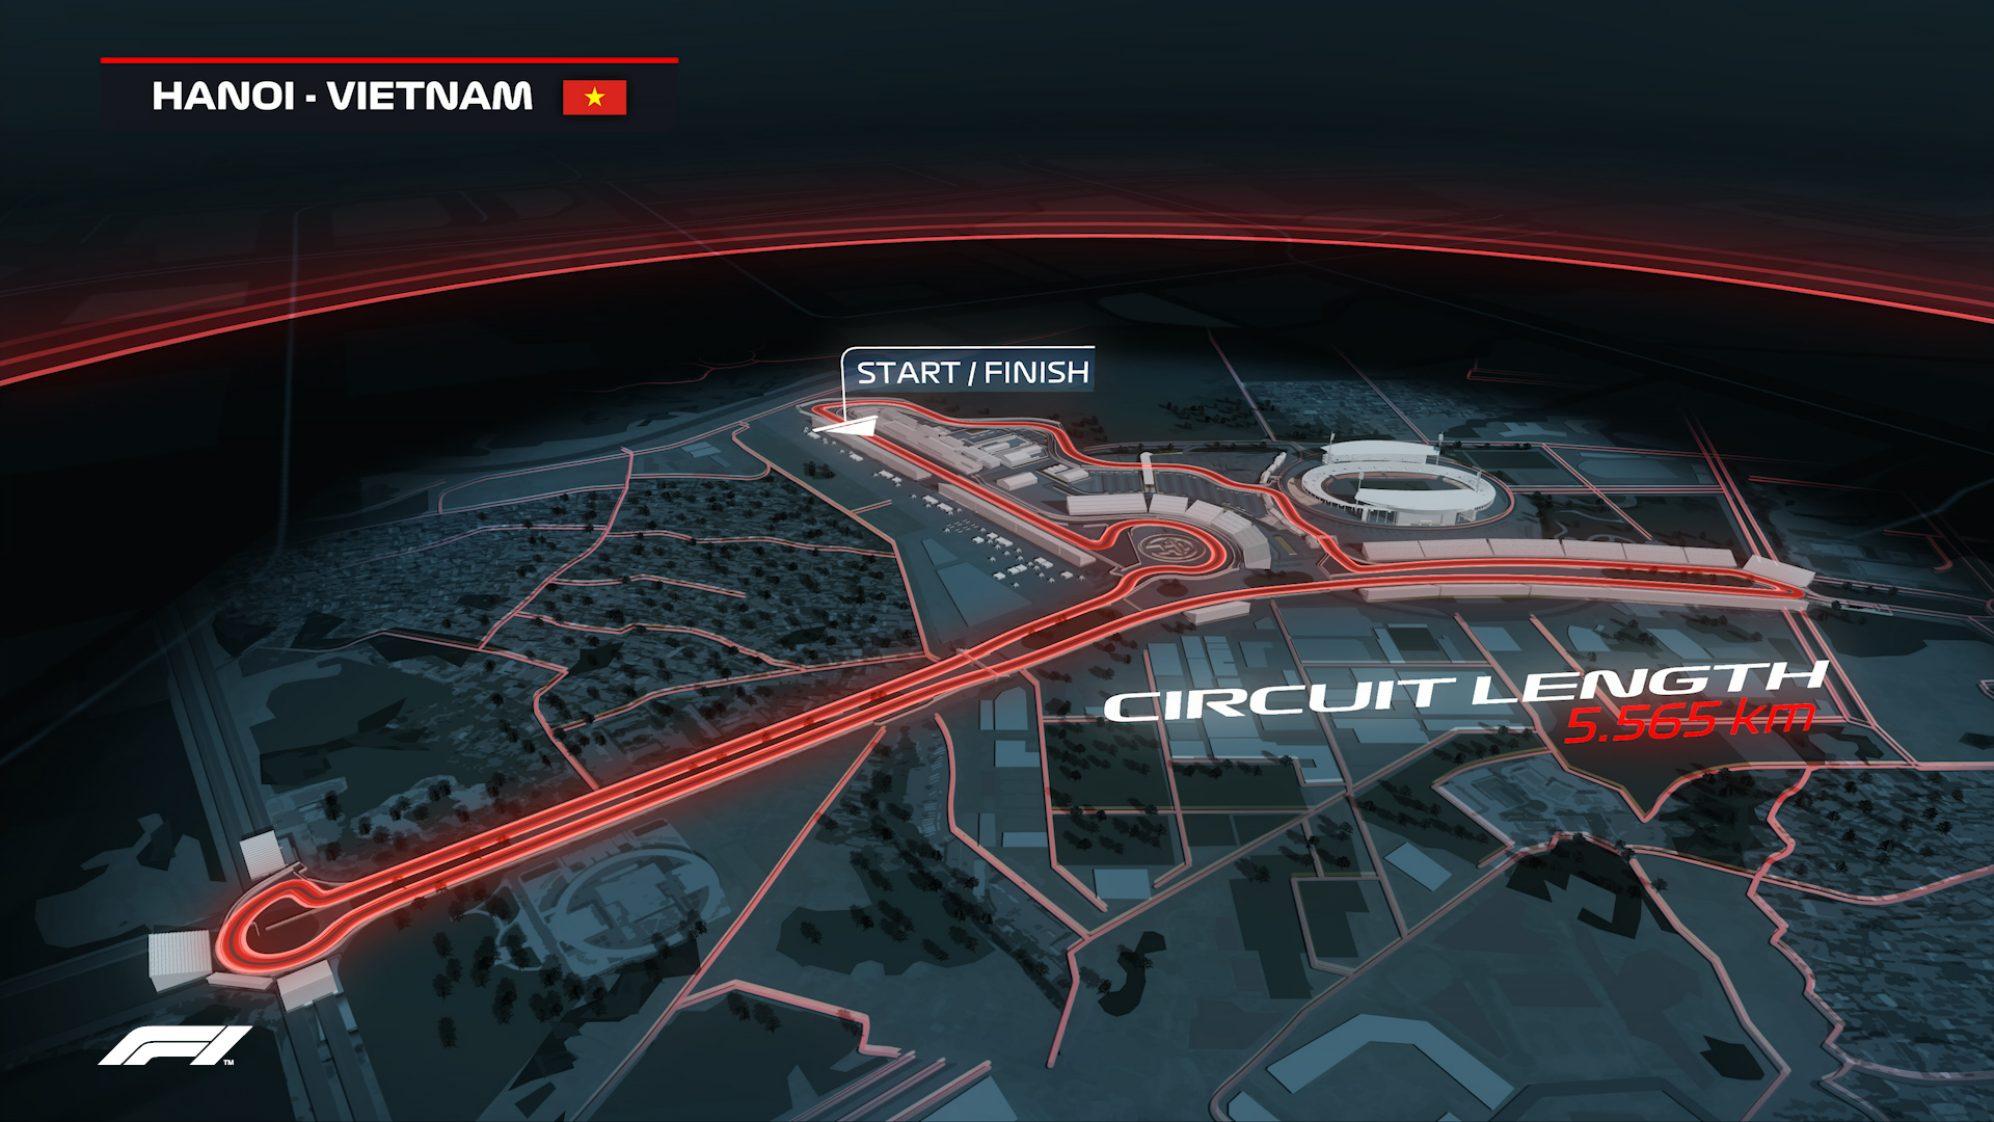 F1 Hanoi track map